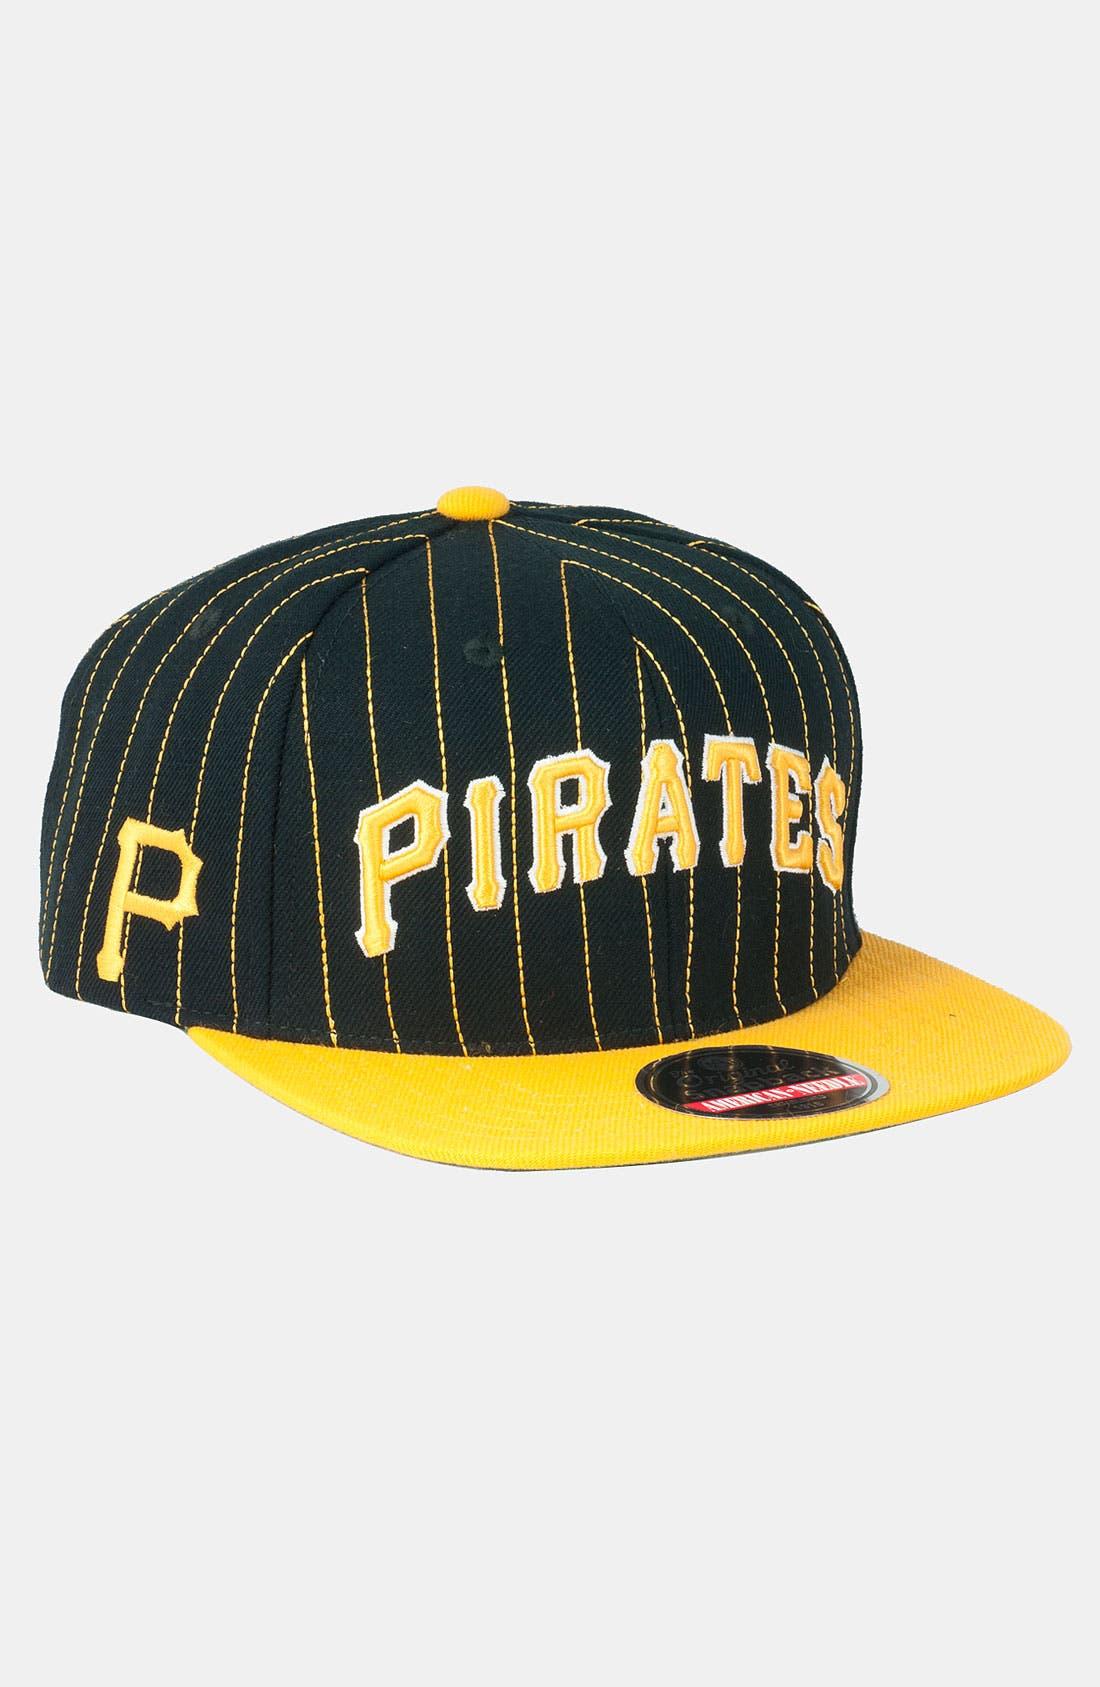 Main Image - American Needle 'Pirates' Snapback Baseball Cap